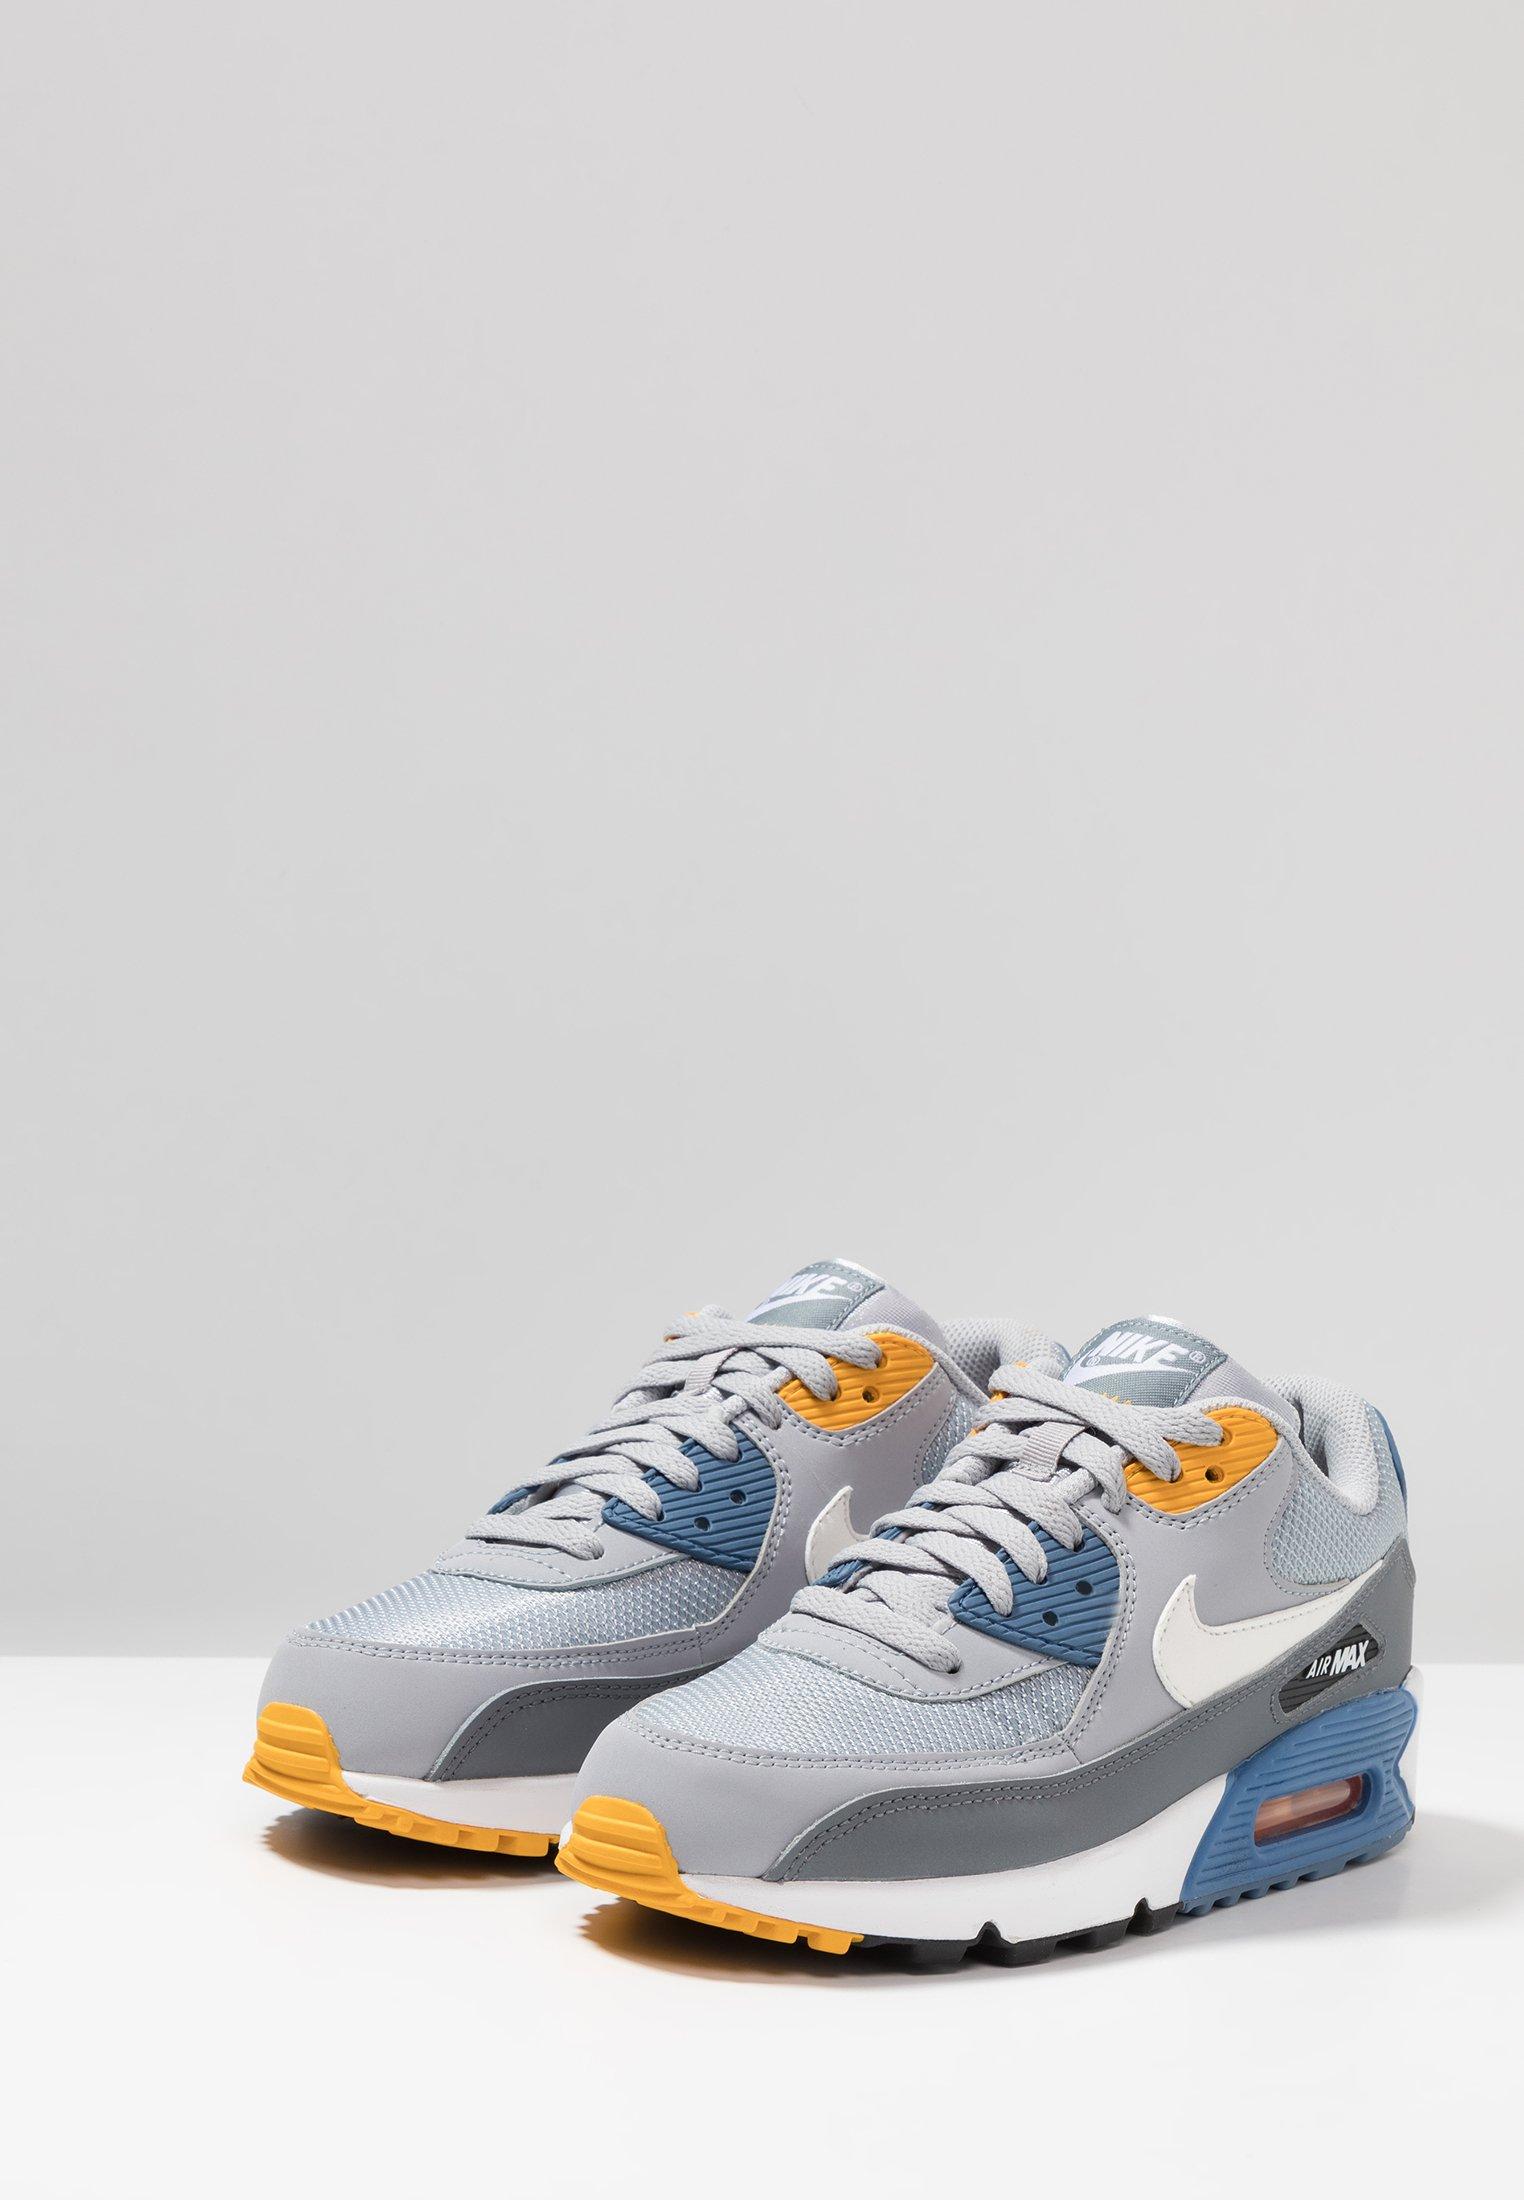 AIR MAX 90 ESSENTIAL Sneakers laag wolf greywhiteindigo stormuniversity goldcool greyanthracite